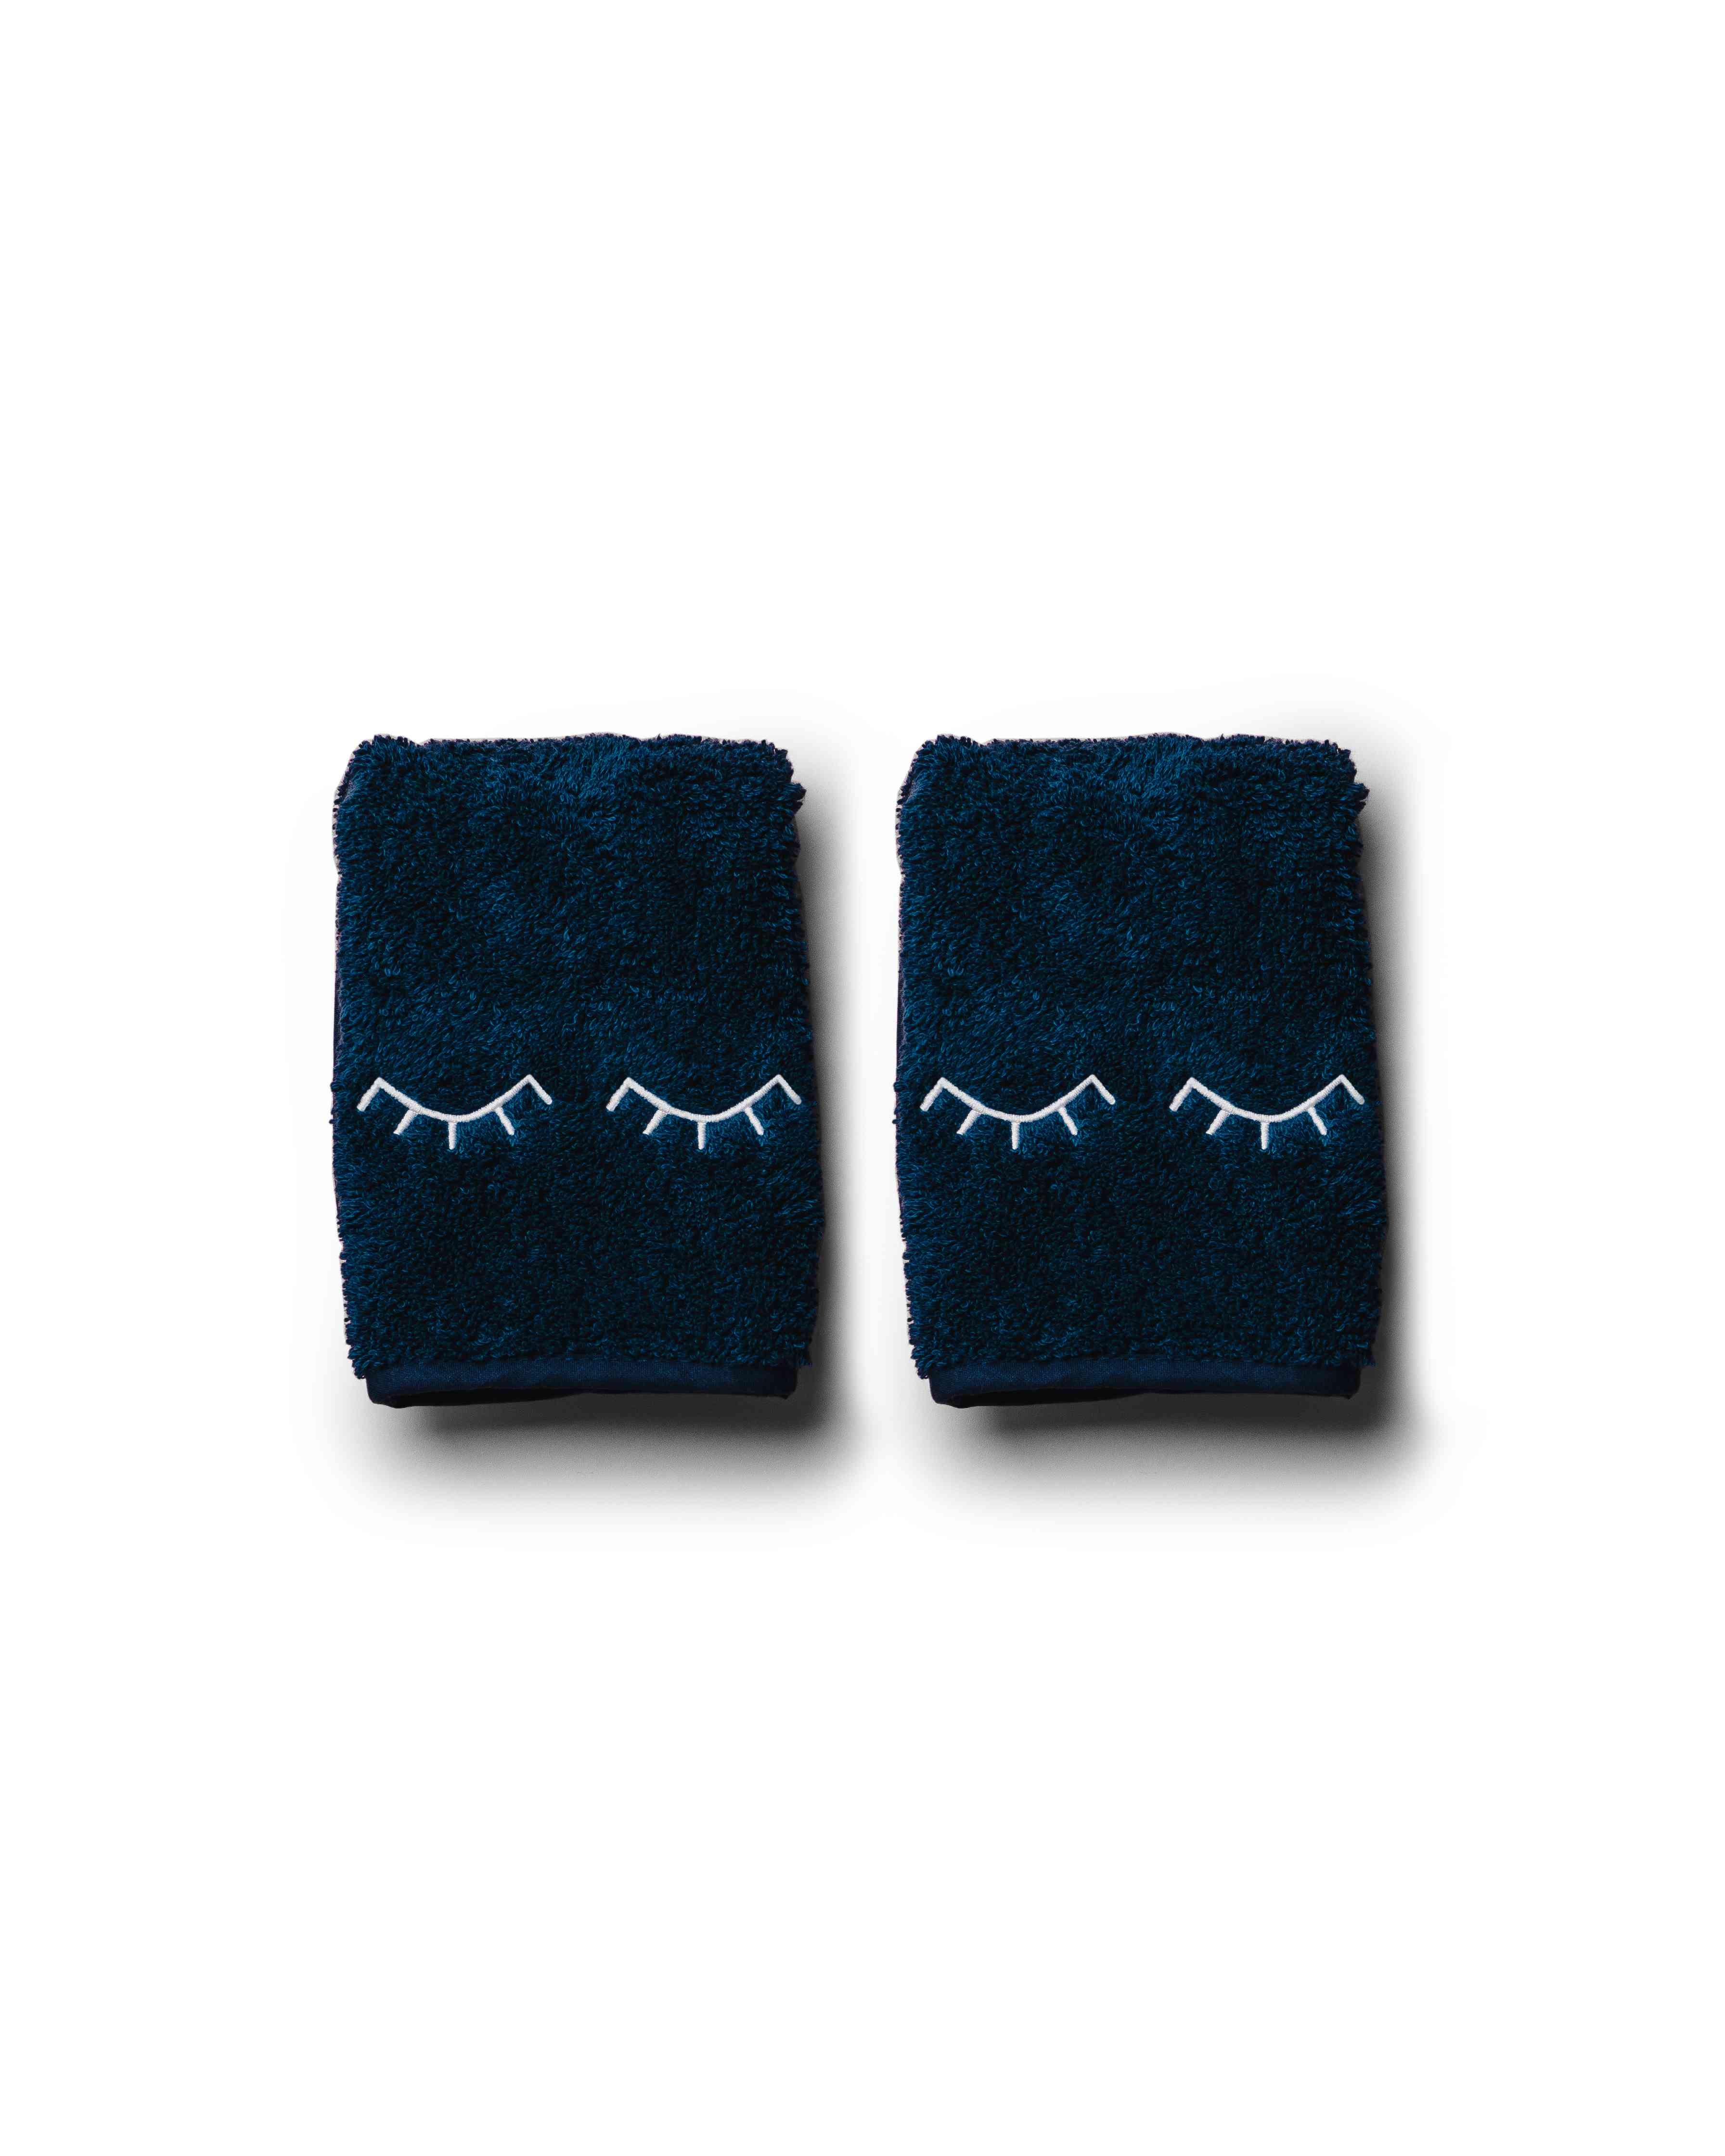 Towels with eyelashes on them